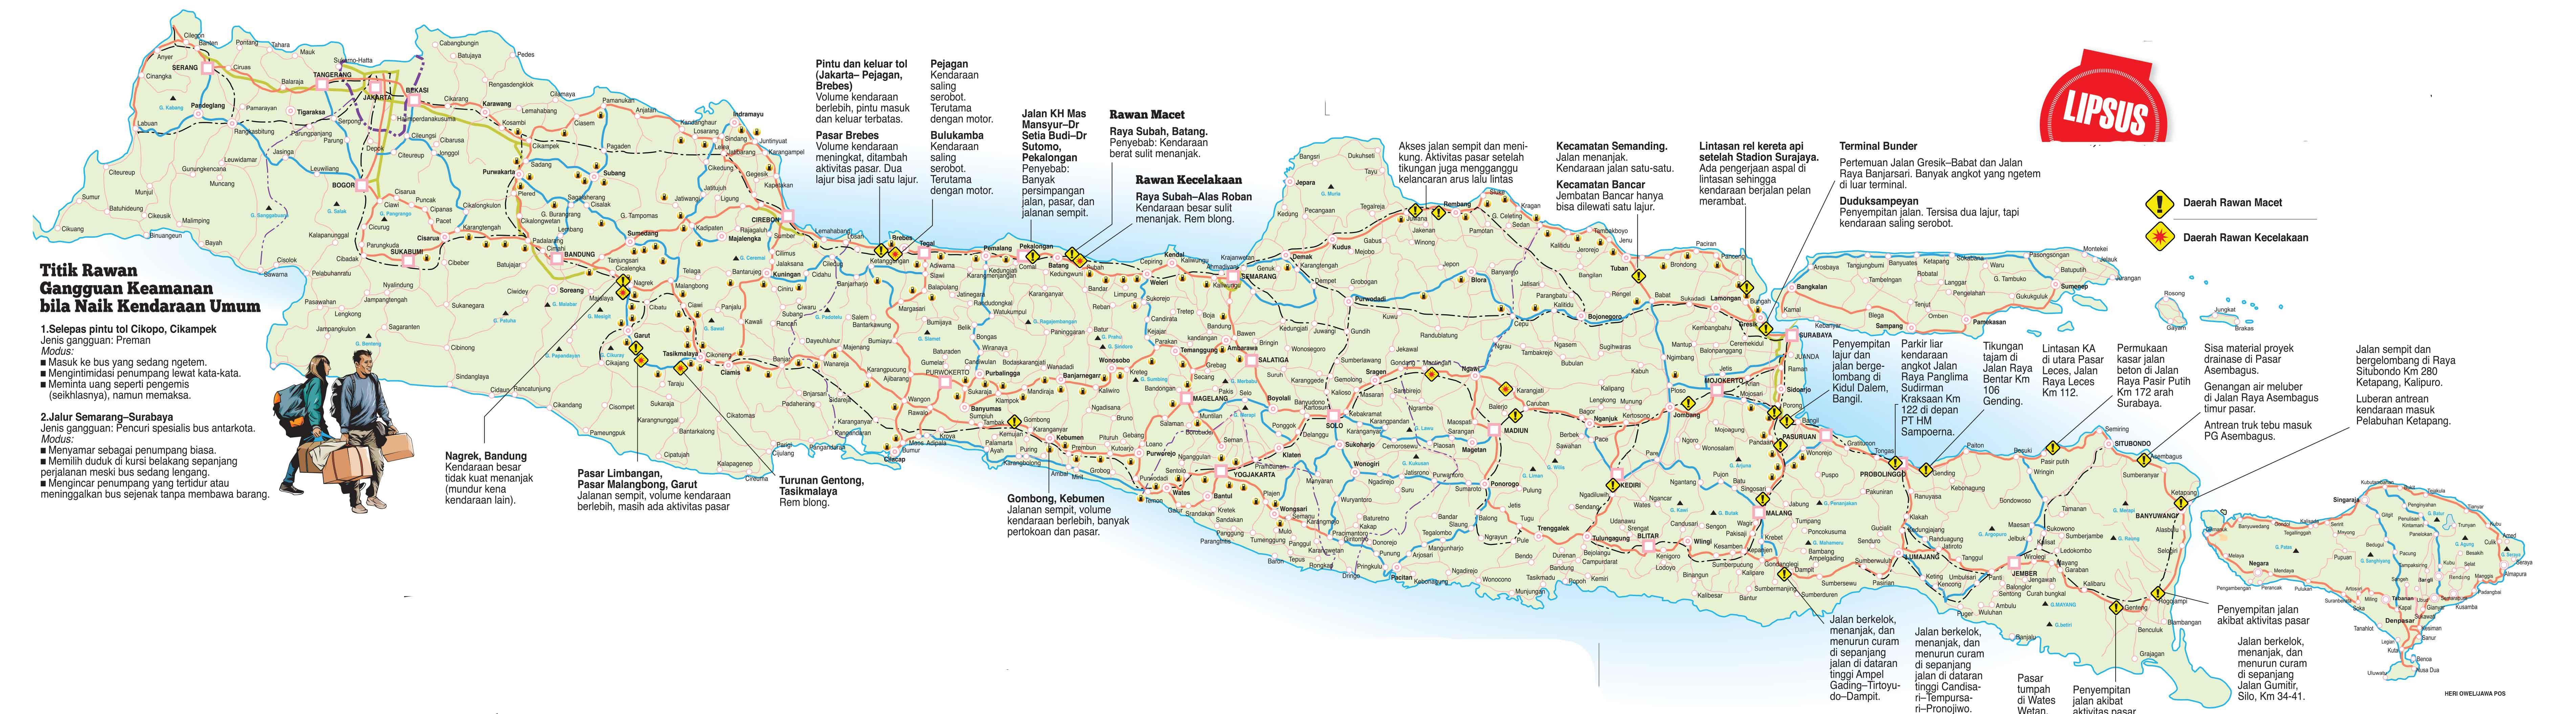 Inilah jalur-jalur vital mudik lebaran di pulau Jawa